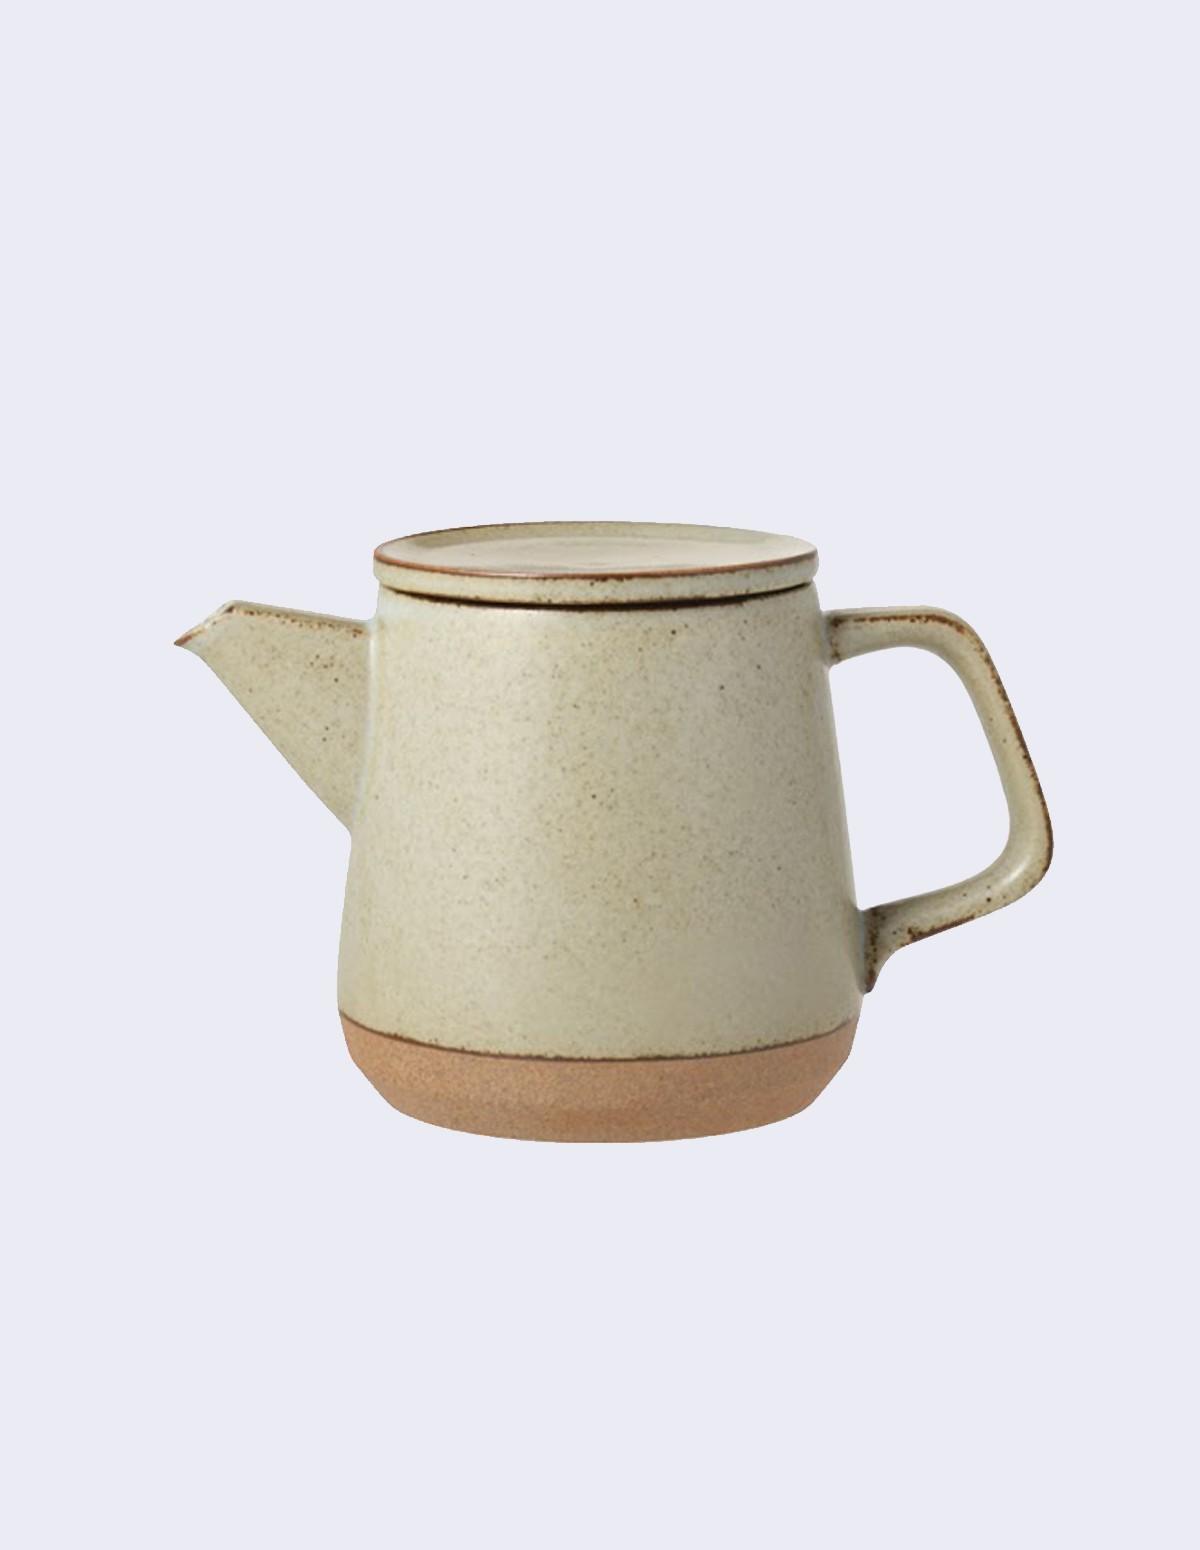 Clk 151 Teapot 500ml - BEIGE